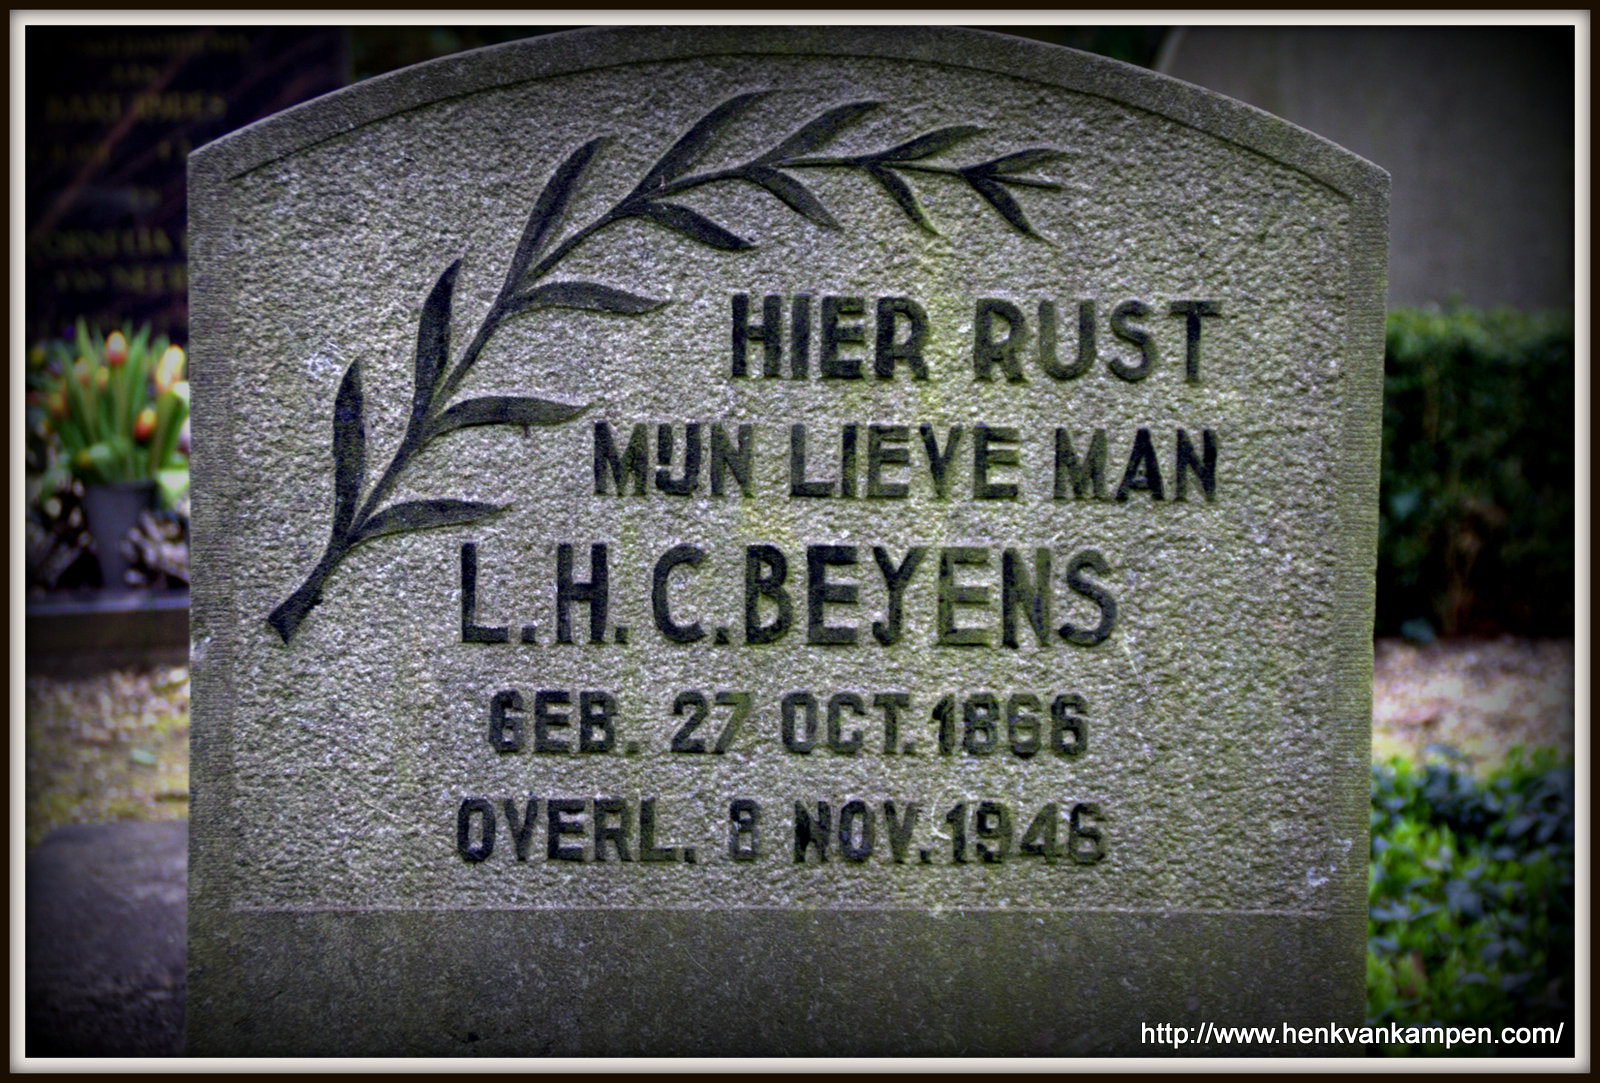 Tombstone of Louis Henri Corneille Beijens, Kerkveld cemetery, Nieuwegein